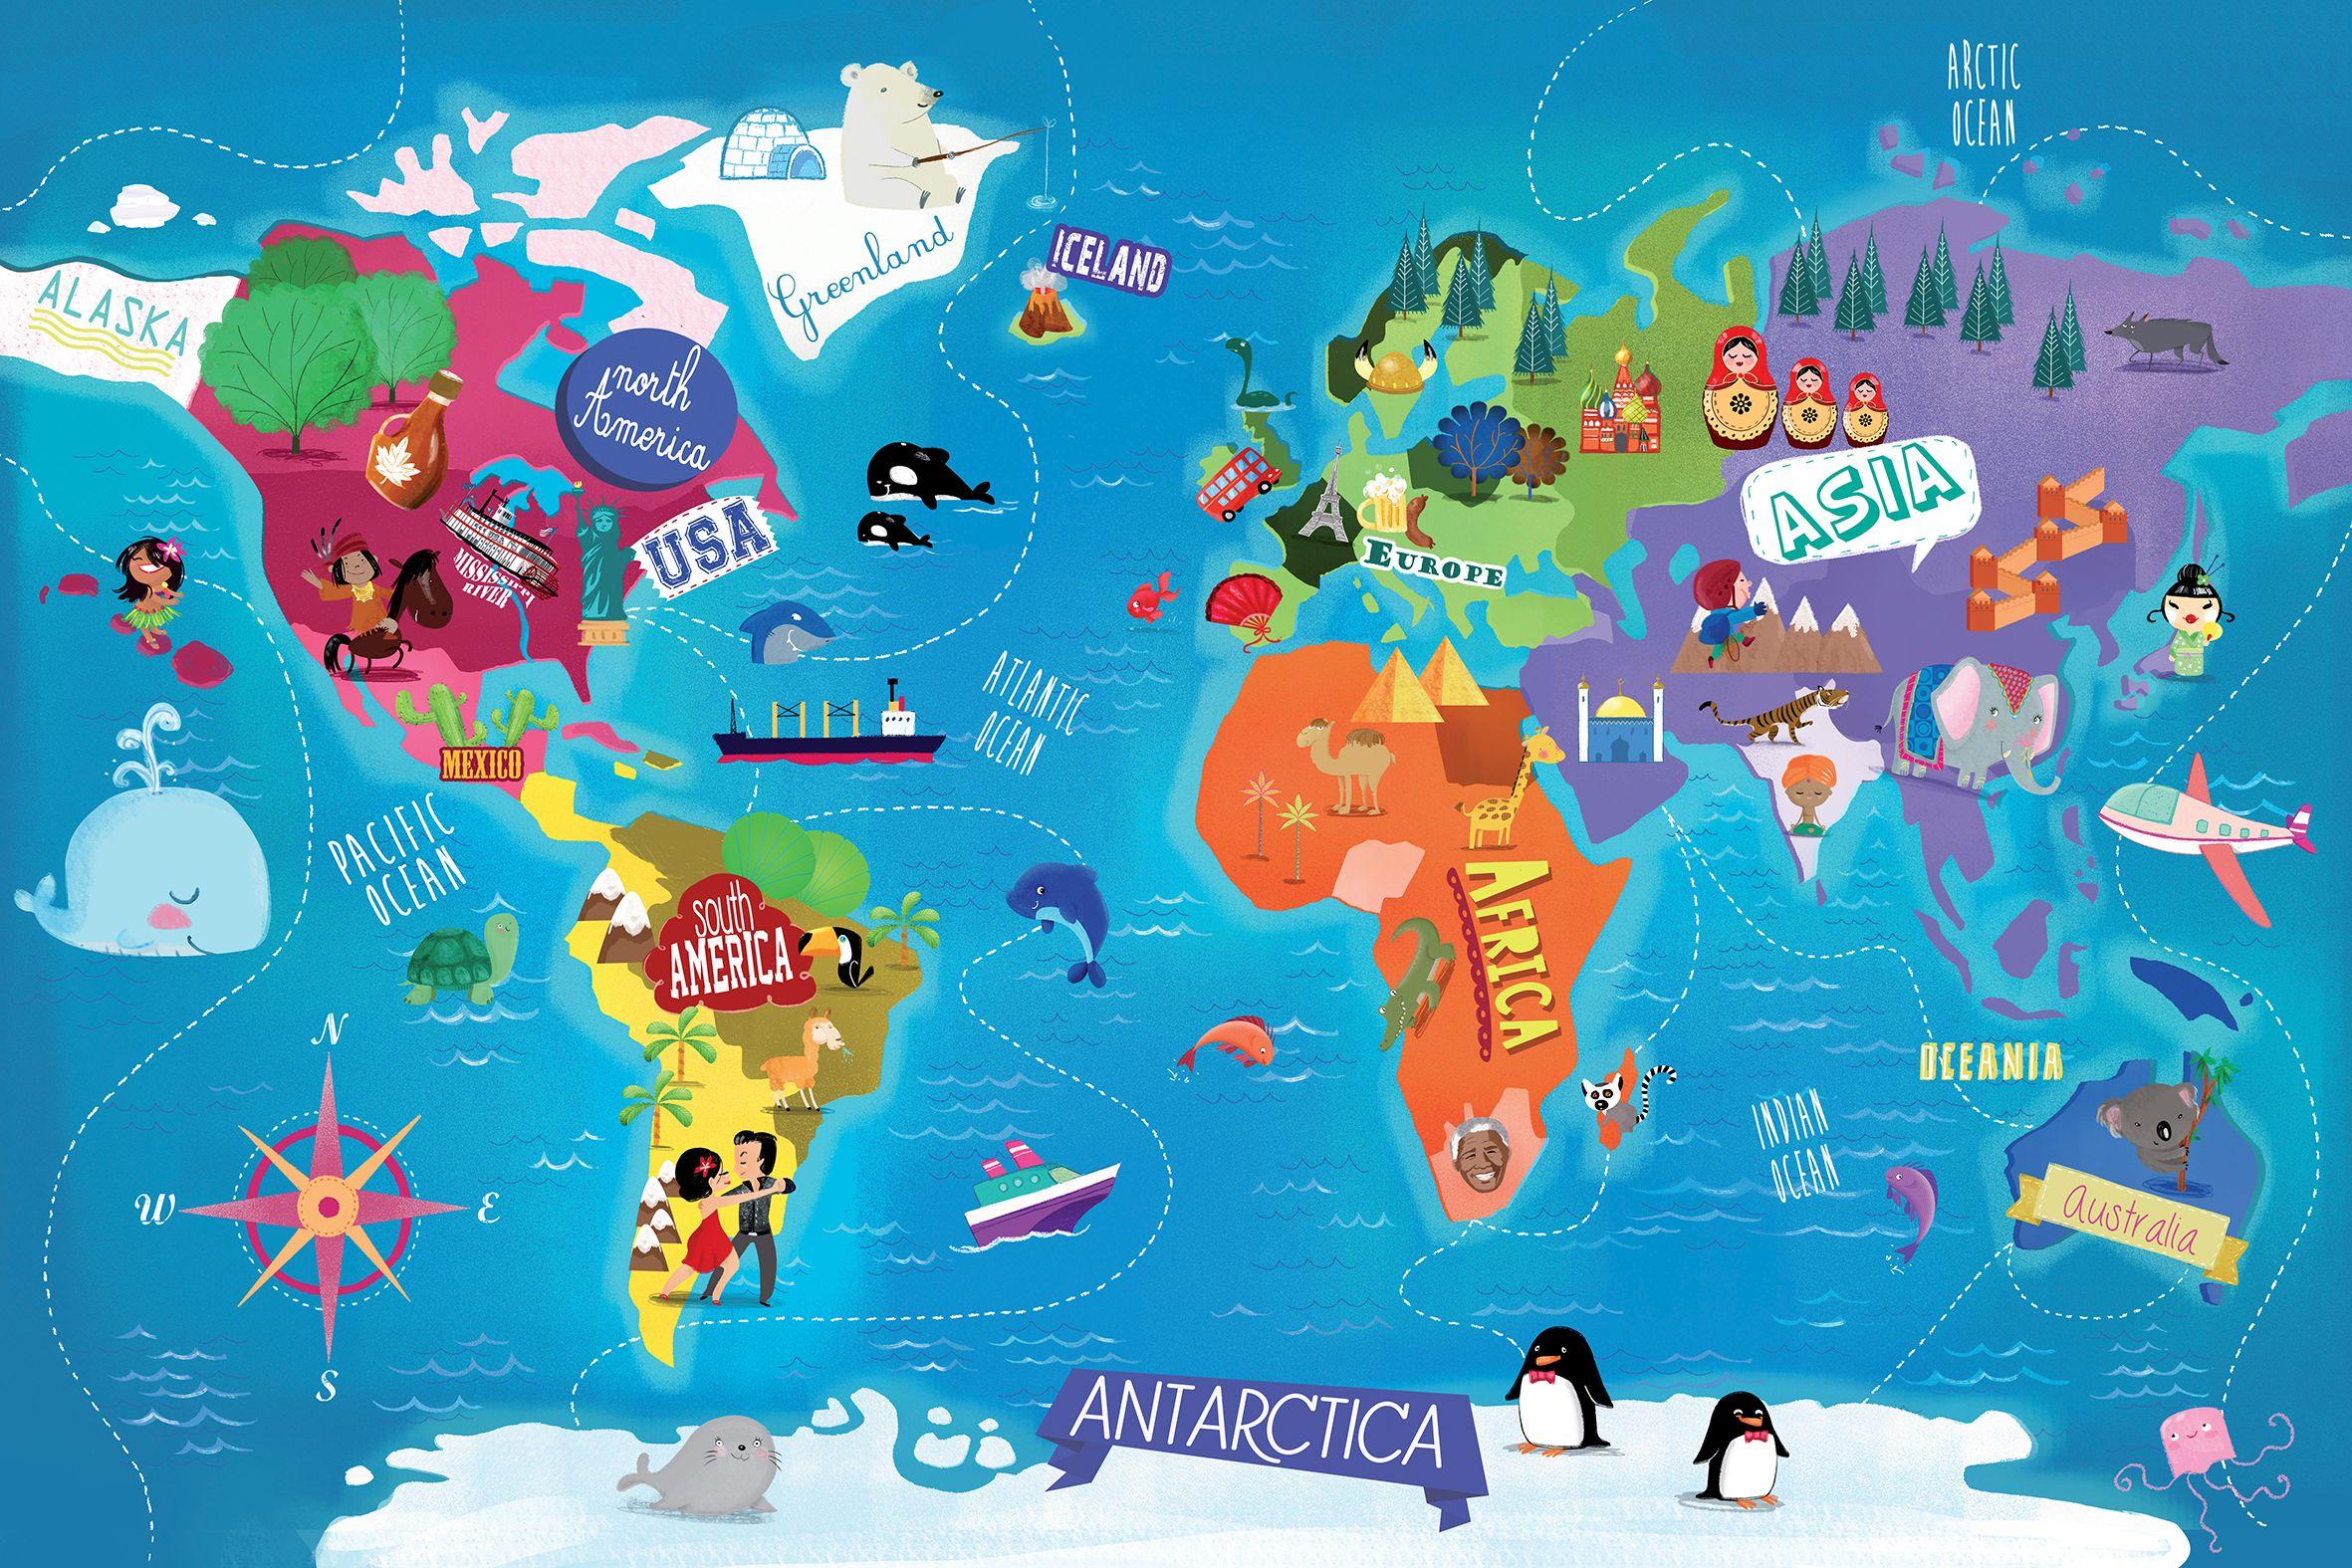 World map barbara bongini map world globe earth planet world map barbara bongini map world globe earth planet continents culture geography childrensbook illustration kidlitart barbarabongini gumiabroncs Image collections